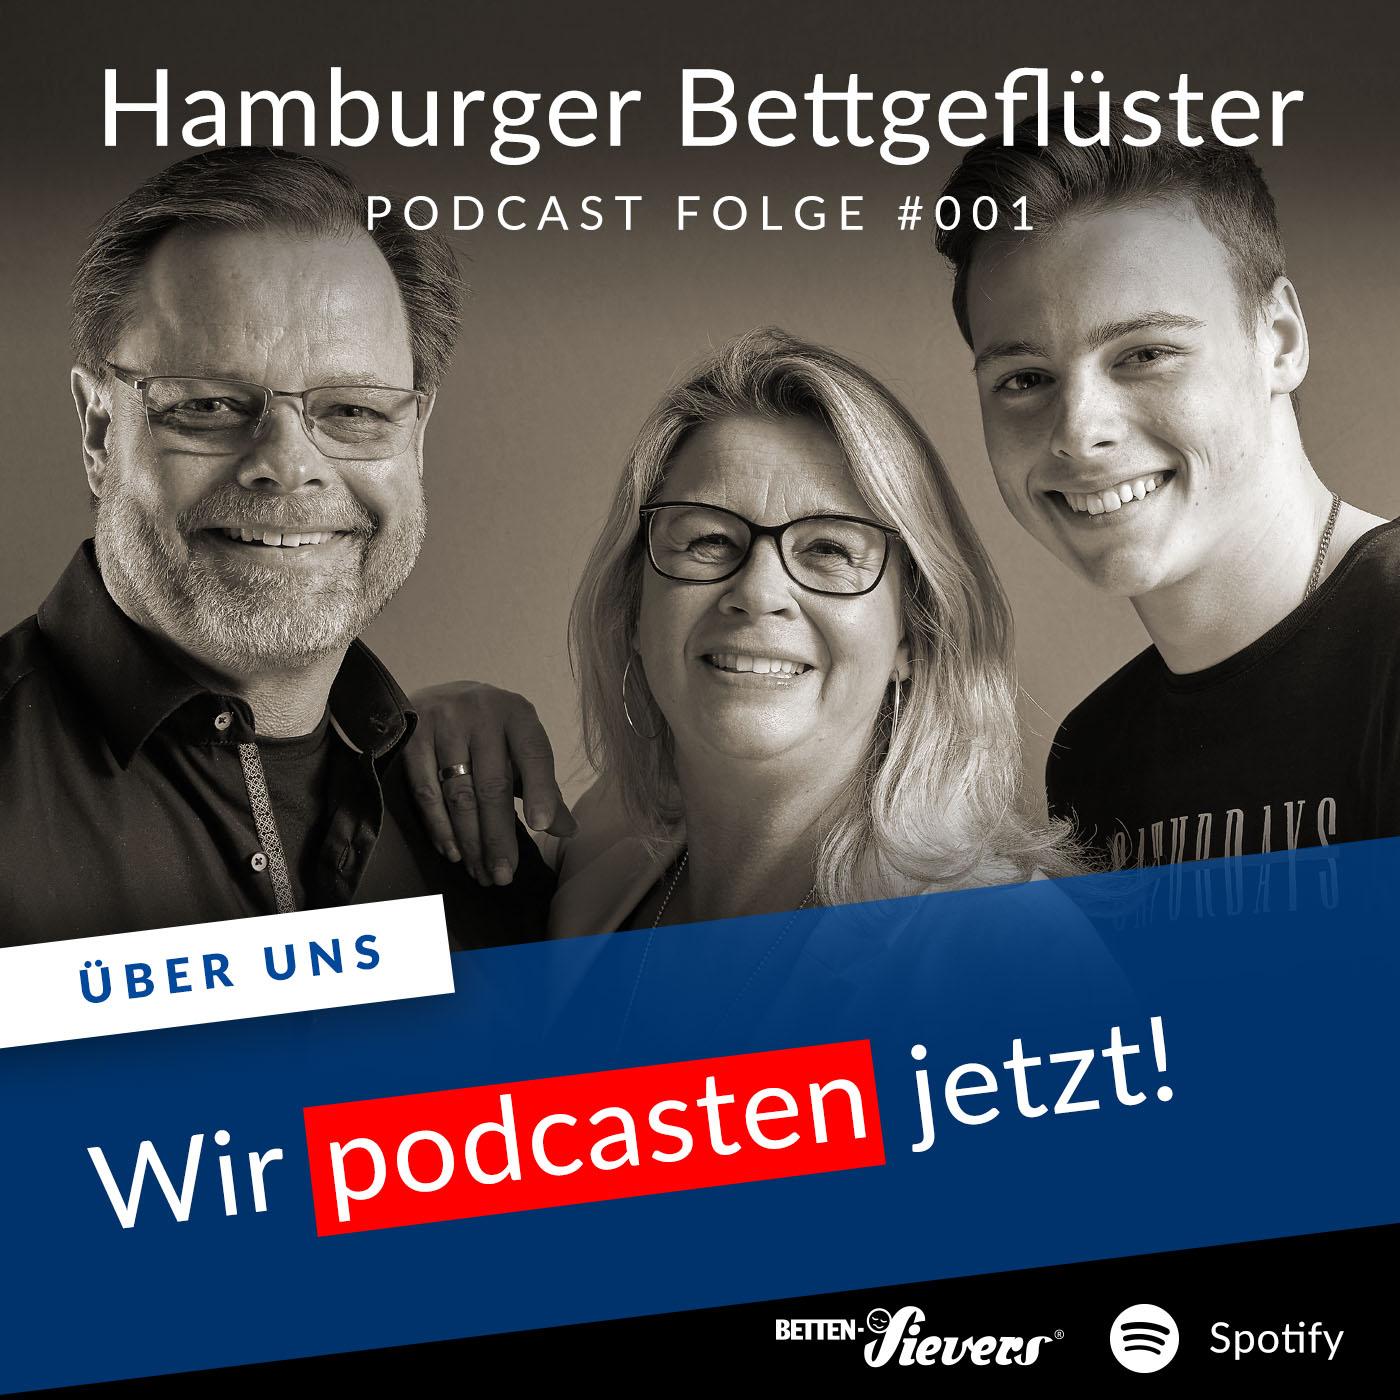 Folge#001 Podcast Hamburger Bettgefluester. Wir podcasten jetzt.